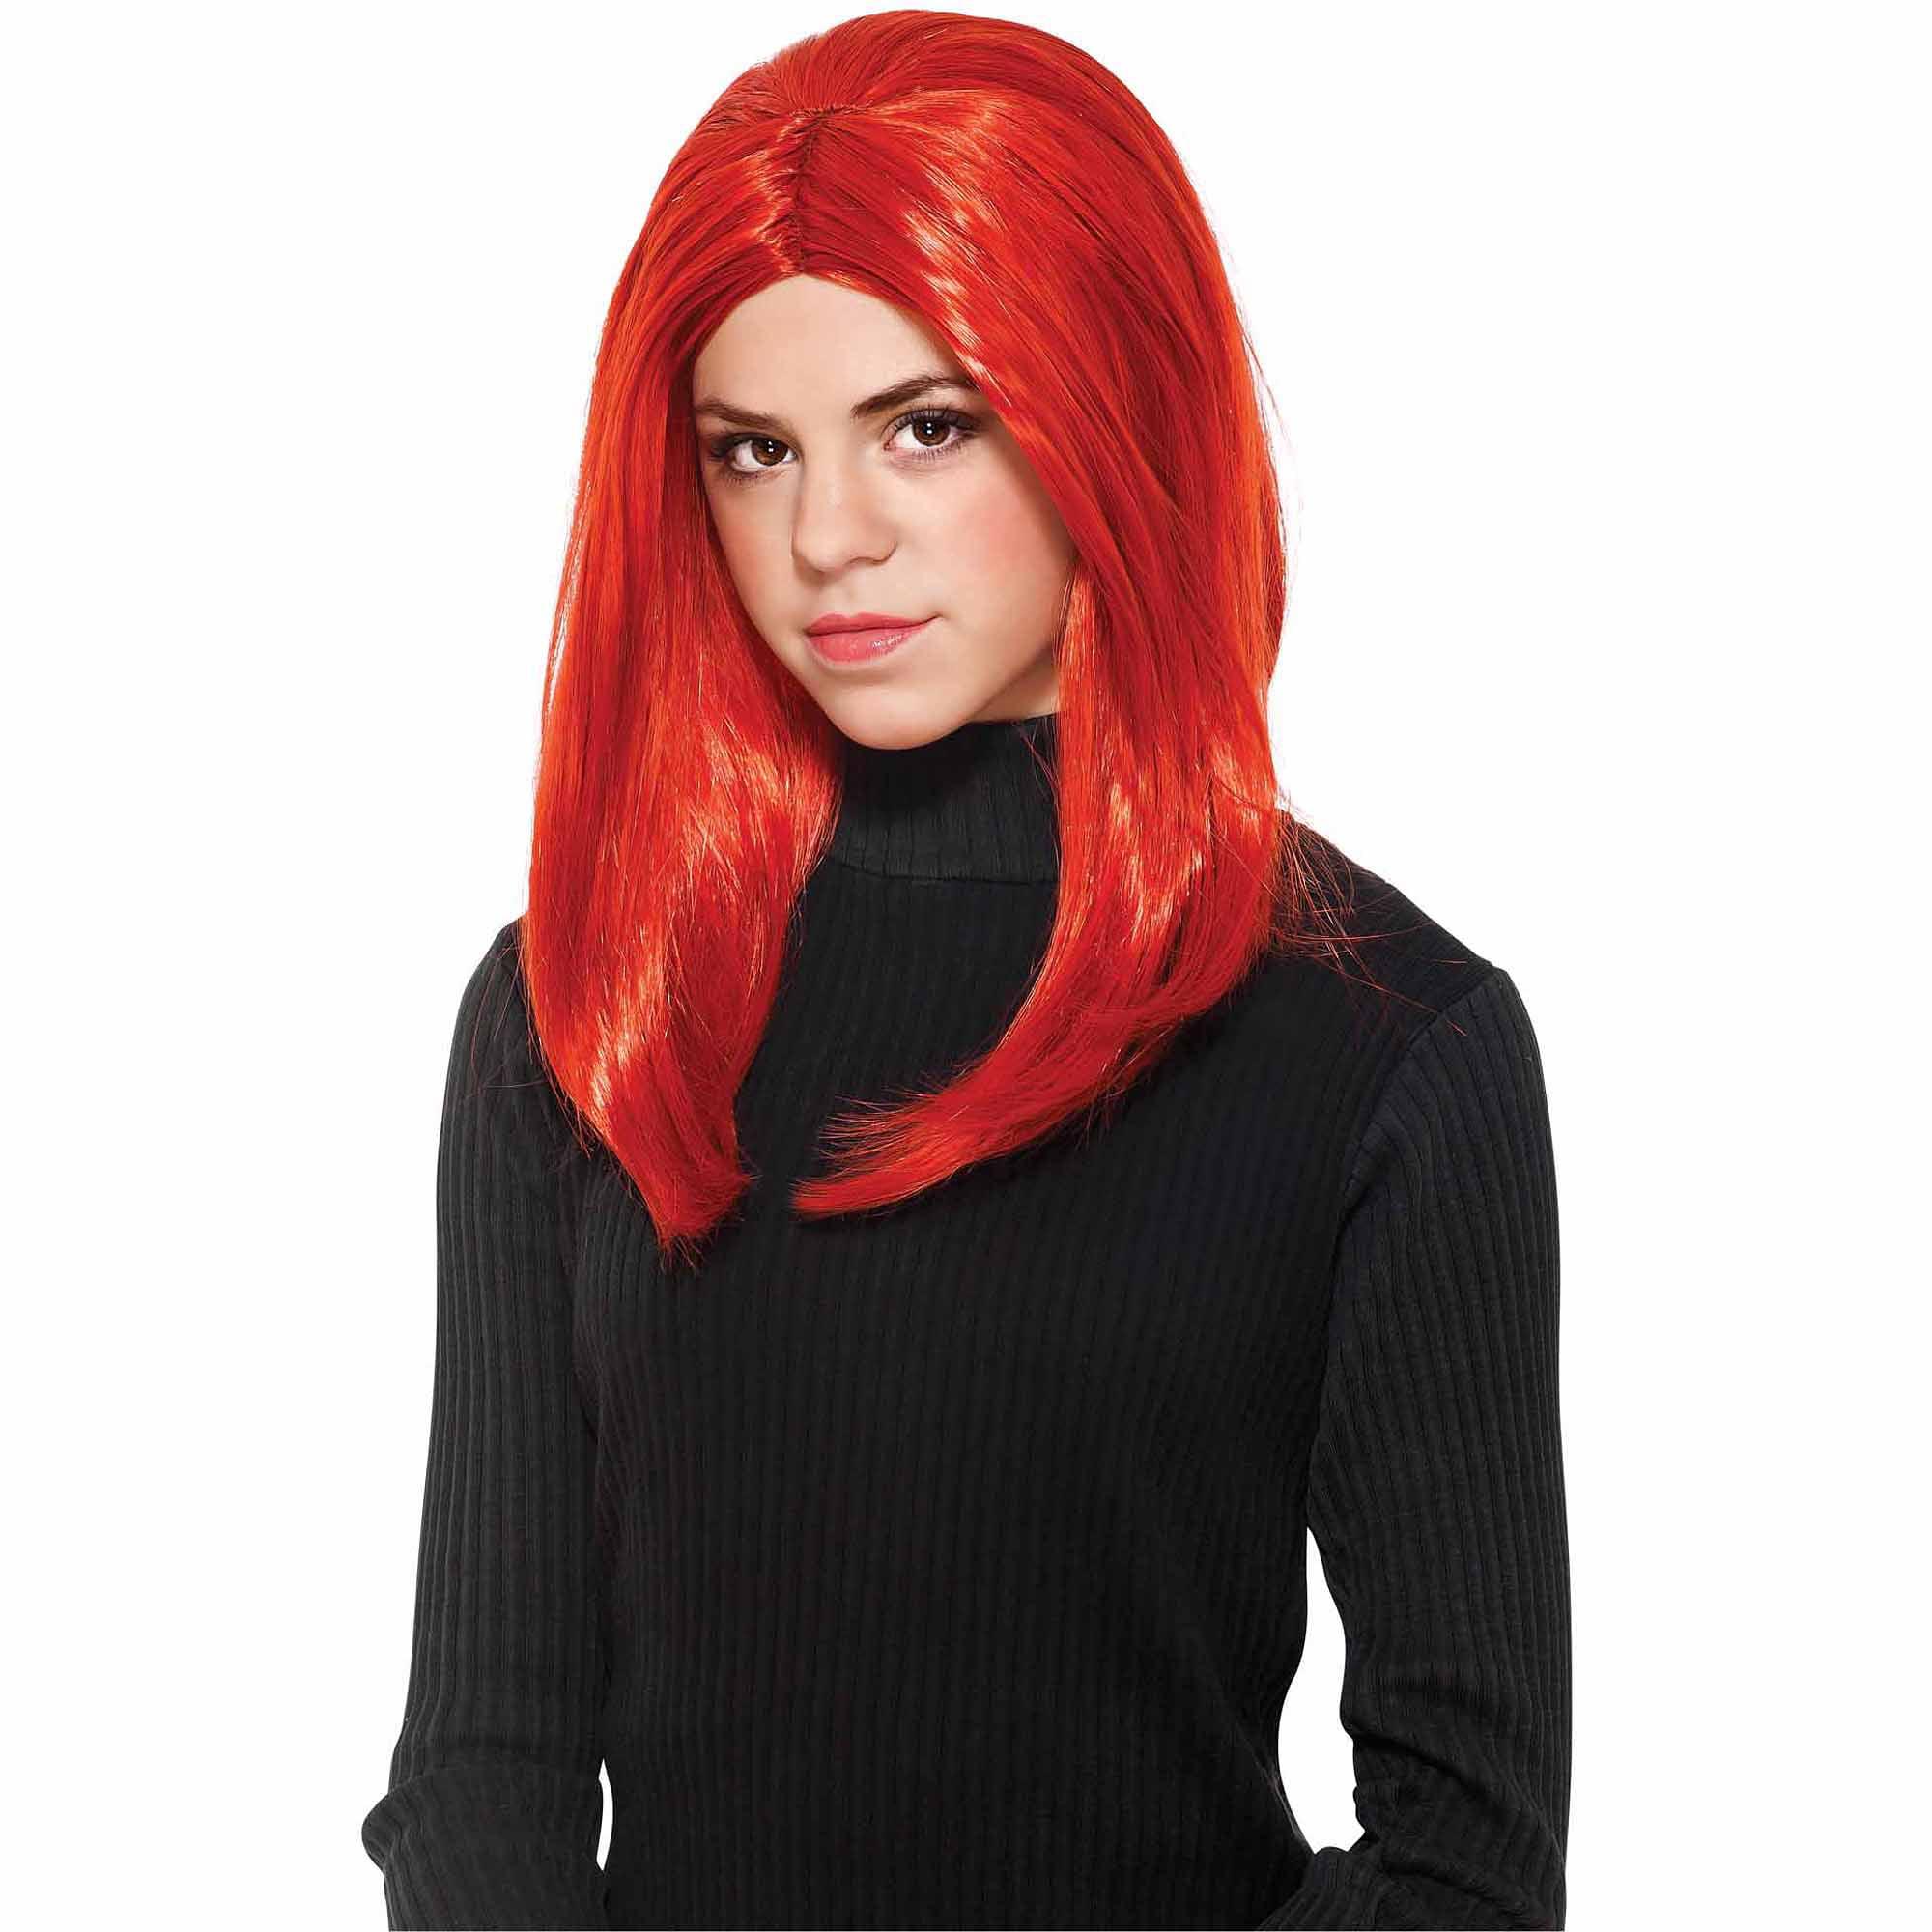 Black Widow Wig Adult Halloween Accessory